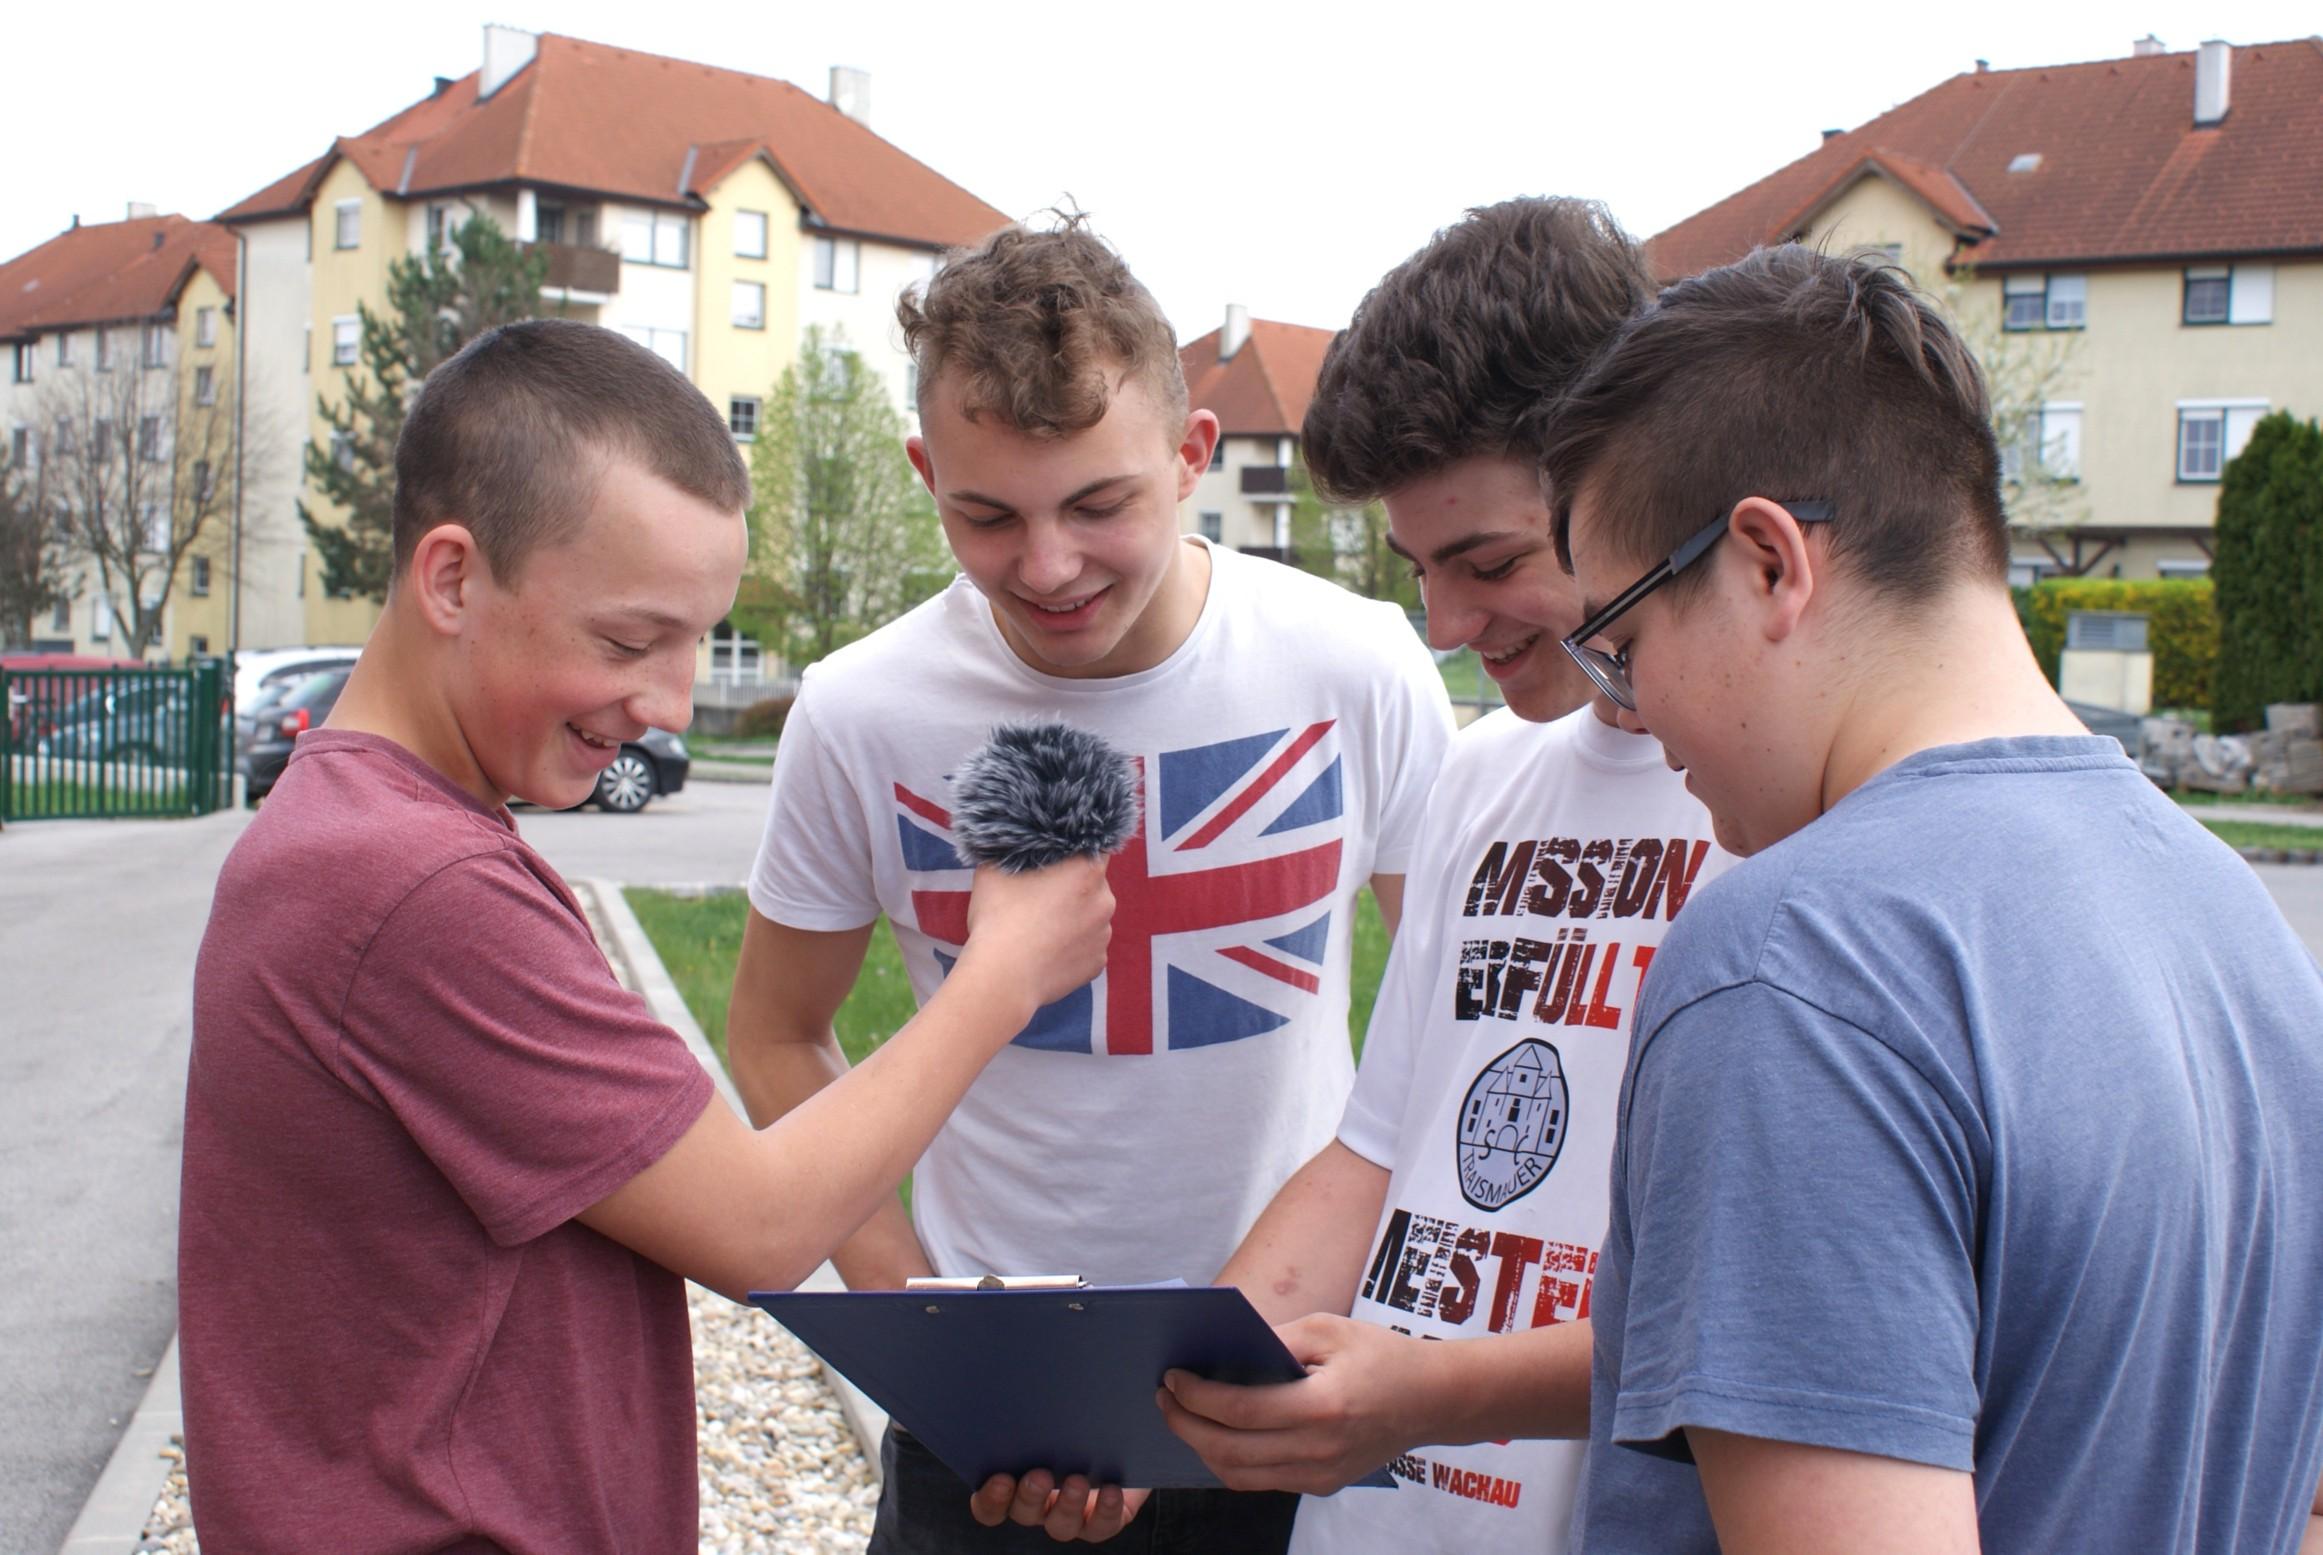 kreAKTIV - Kultur in der Lehre NÖ - LBS Wr. Neustadt 4.Lg 2014